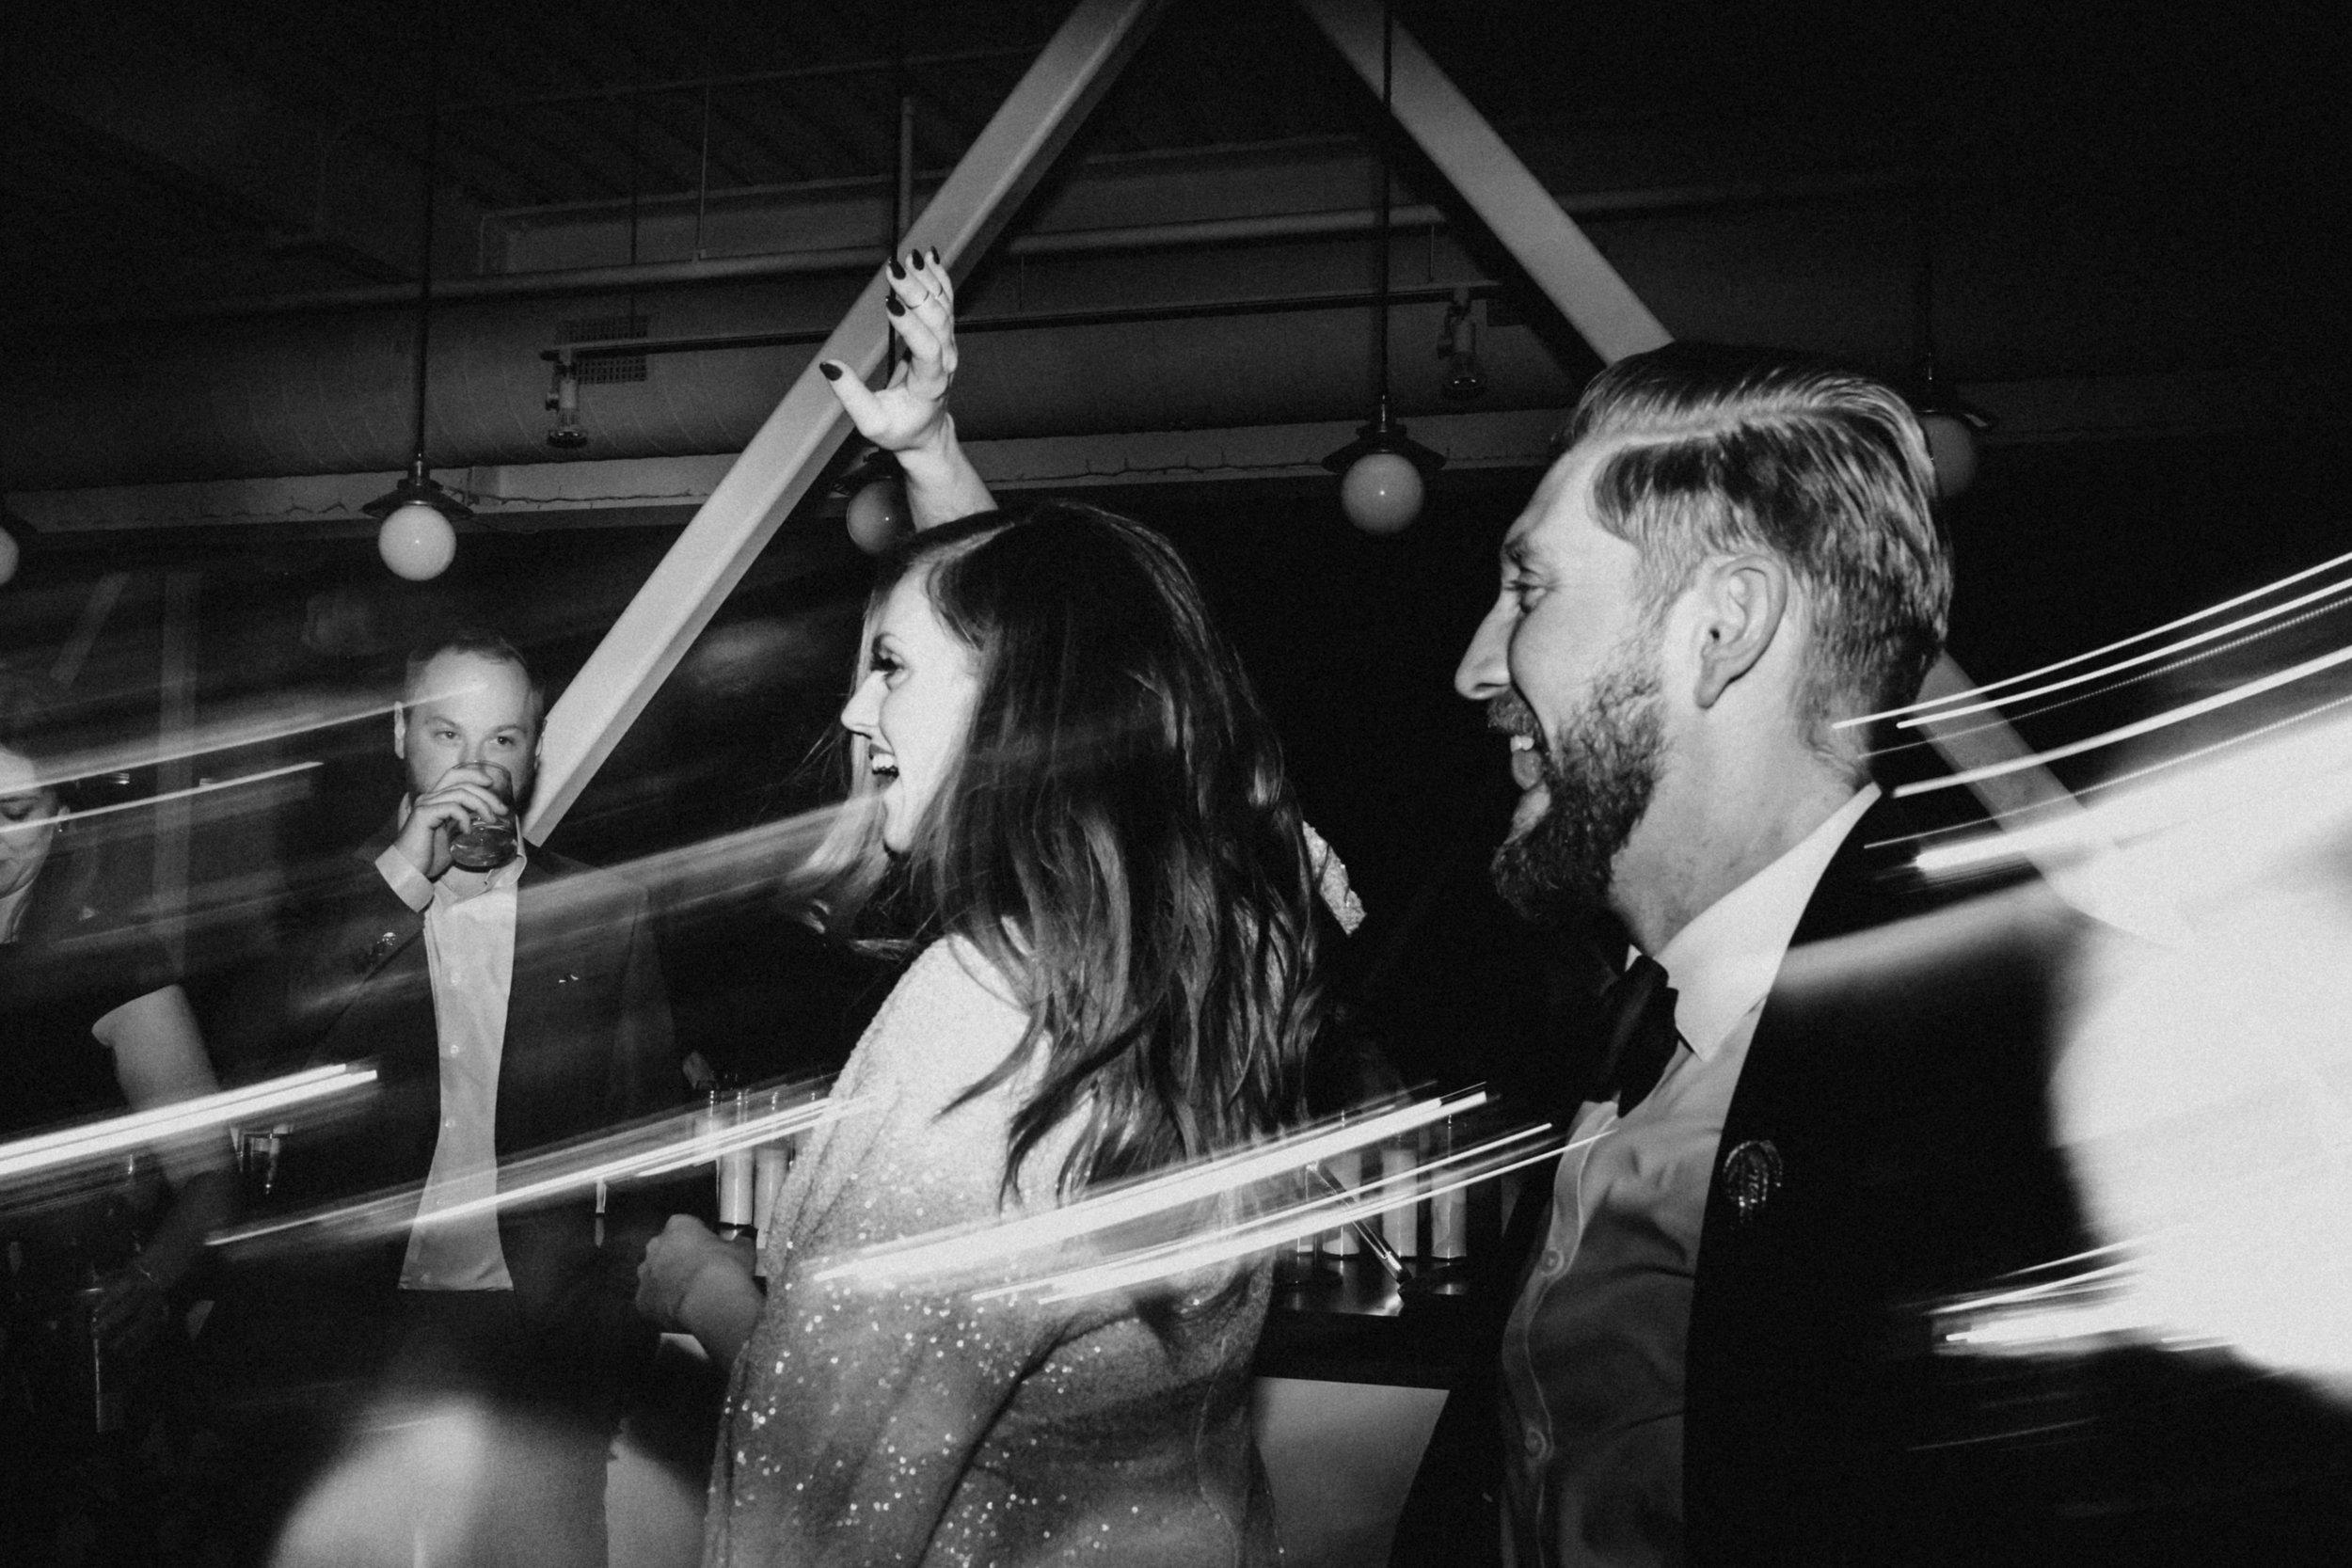 illinois wedding photographer editorial style